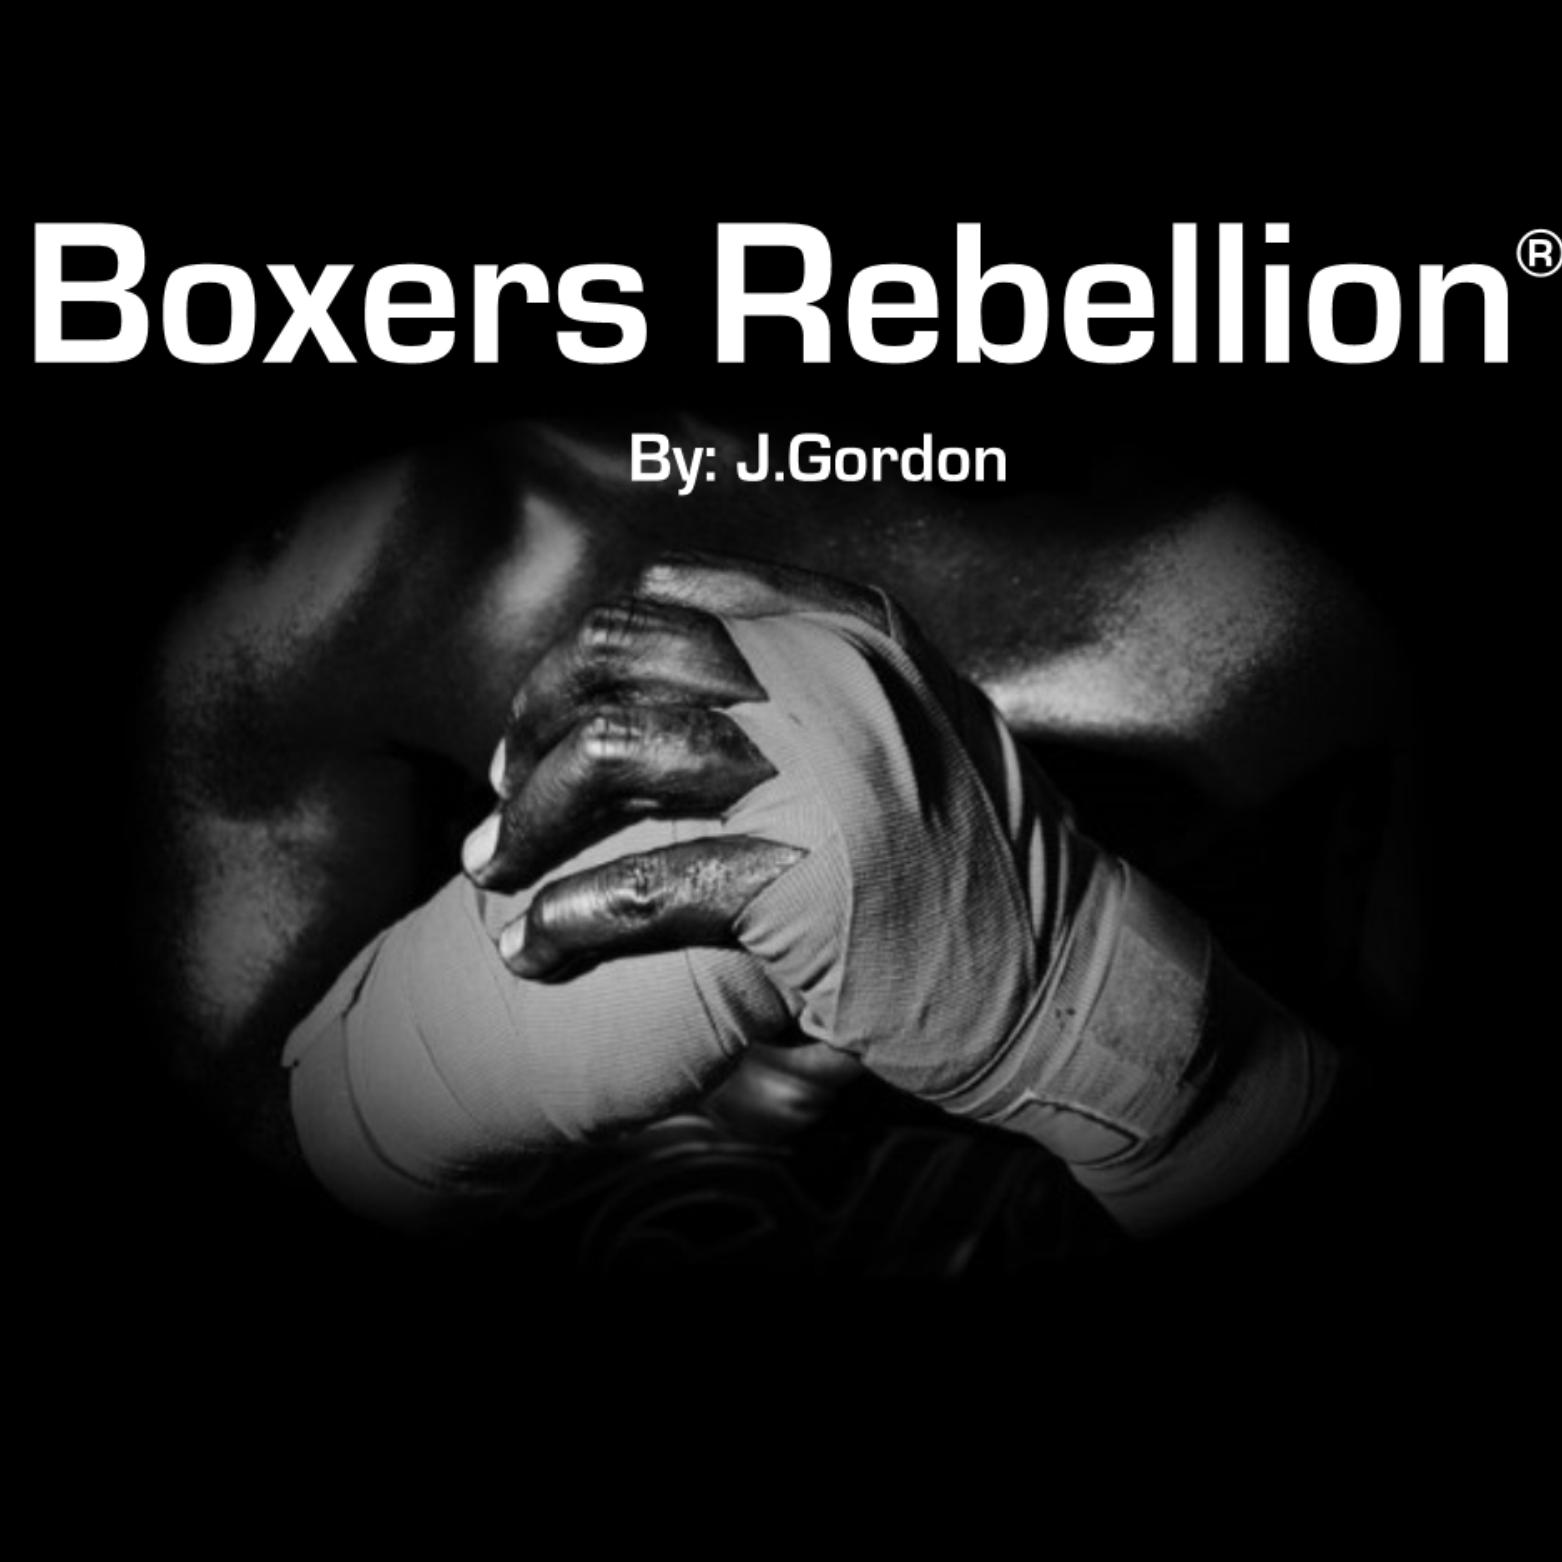 Boxers Rebellion (Brazilian Jiu Jitsu)